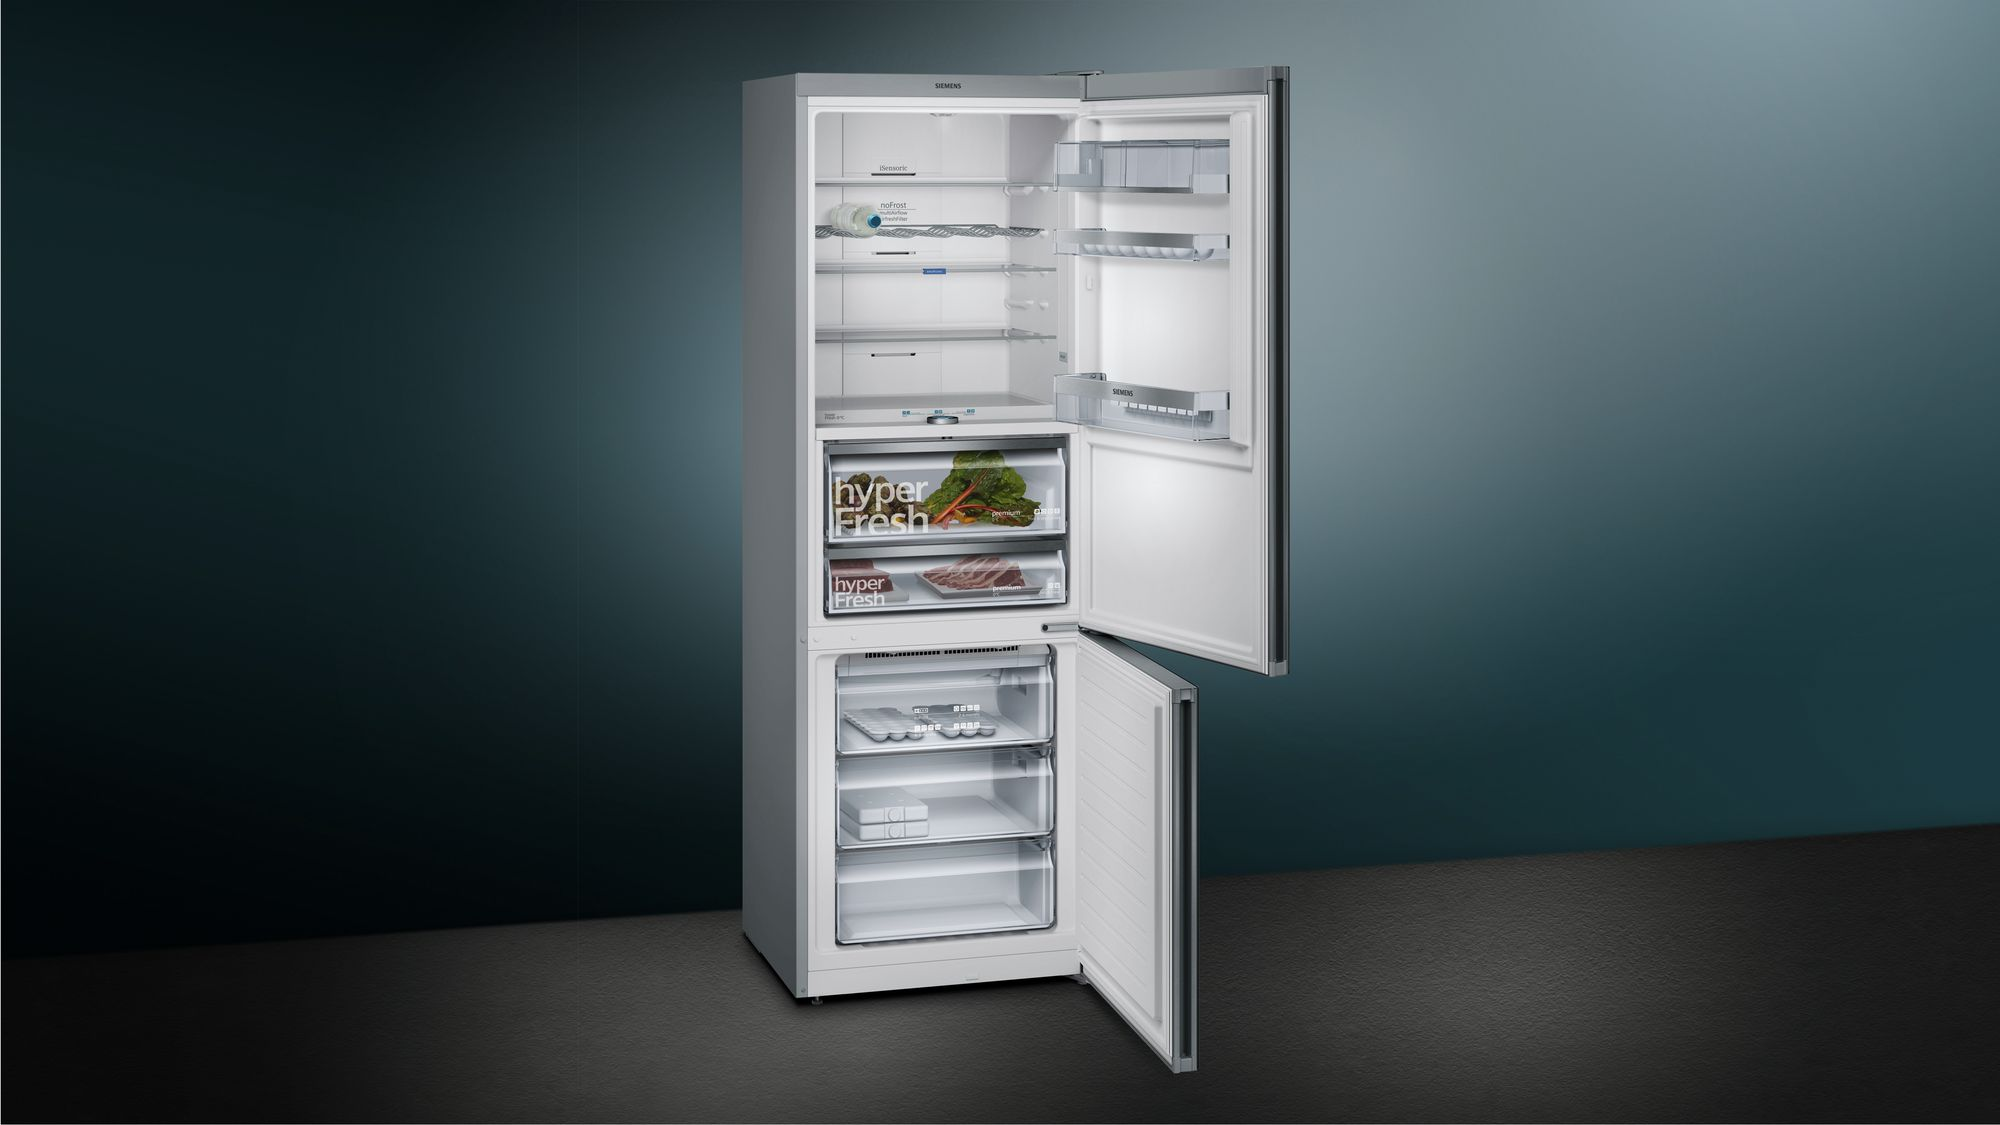 Siemens Kühlschrank Vitafresh Bedienungsanleitung : Холодильник siemens kg nsb ar магазин БВТ